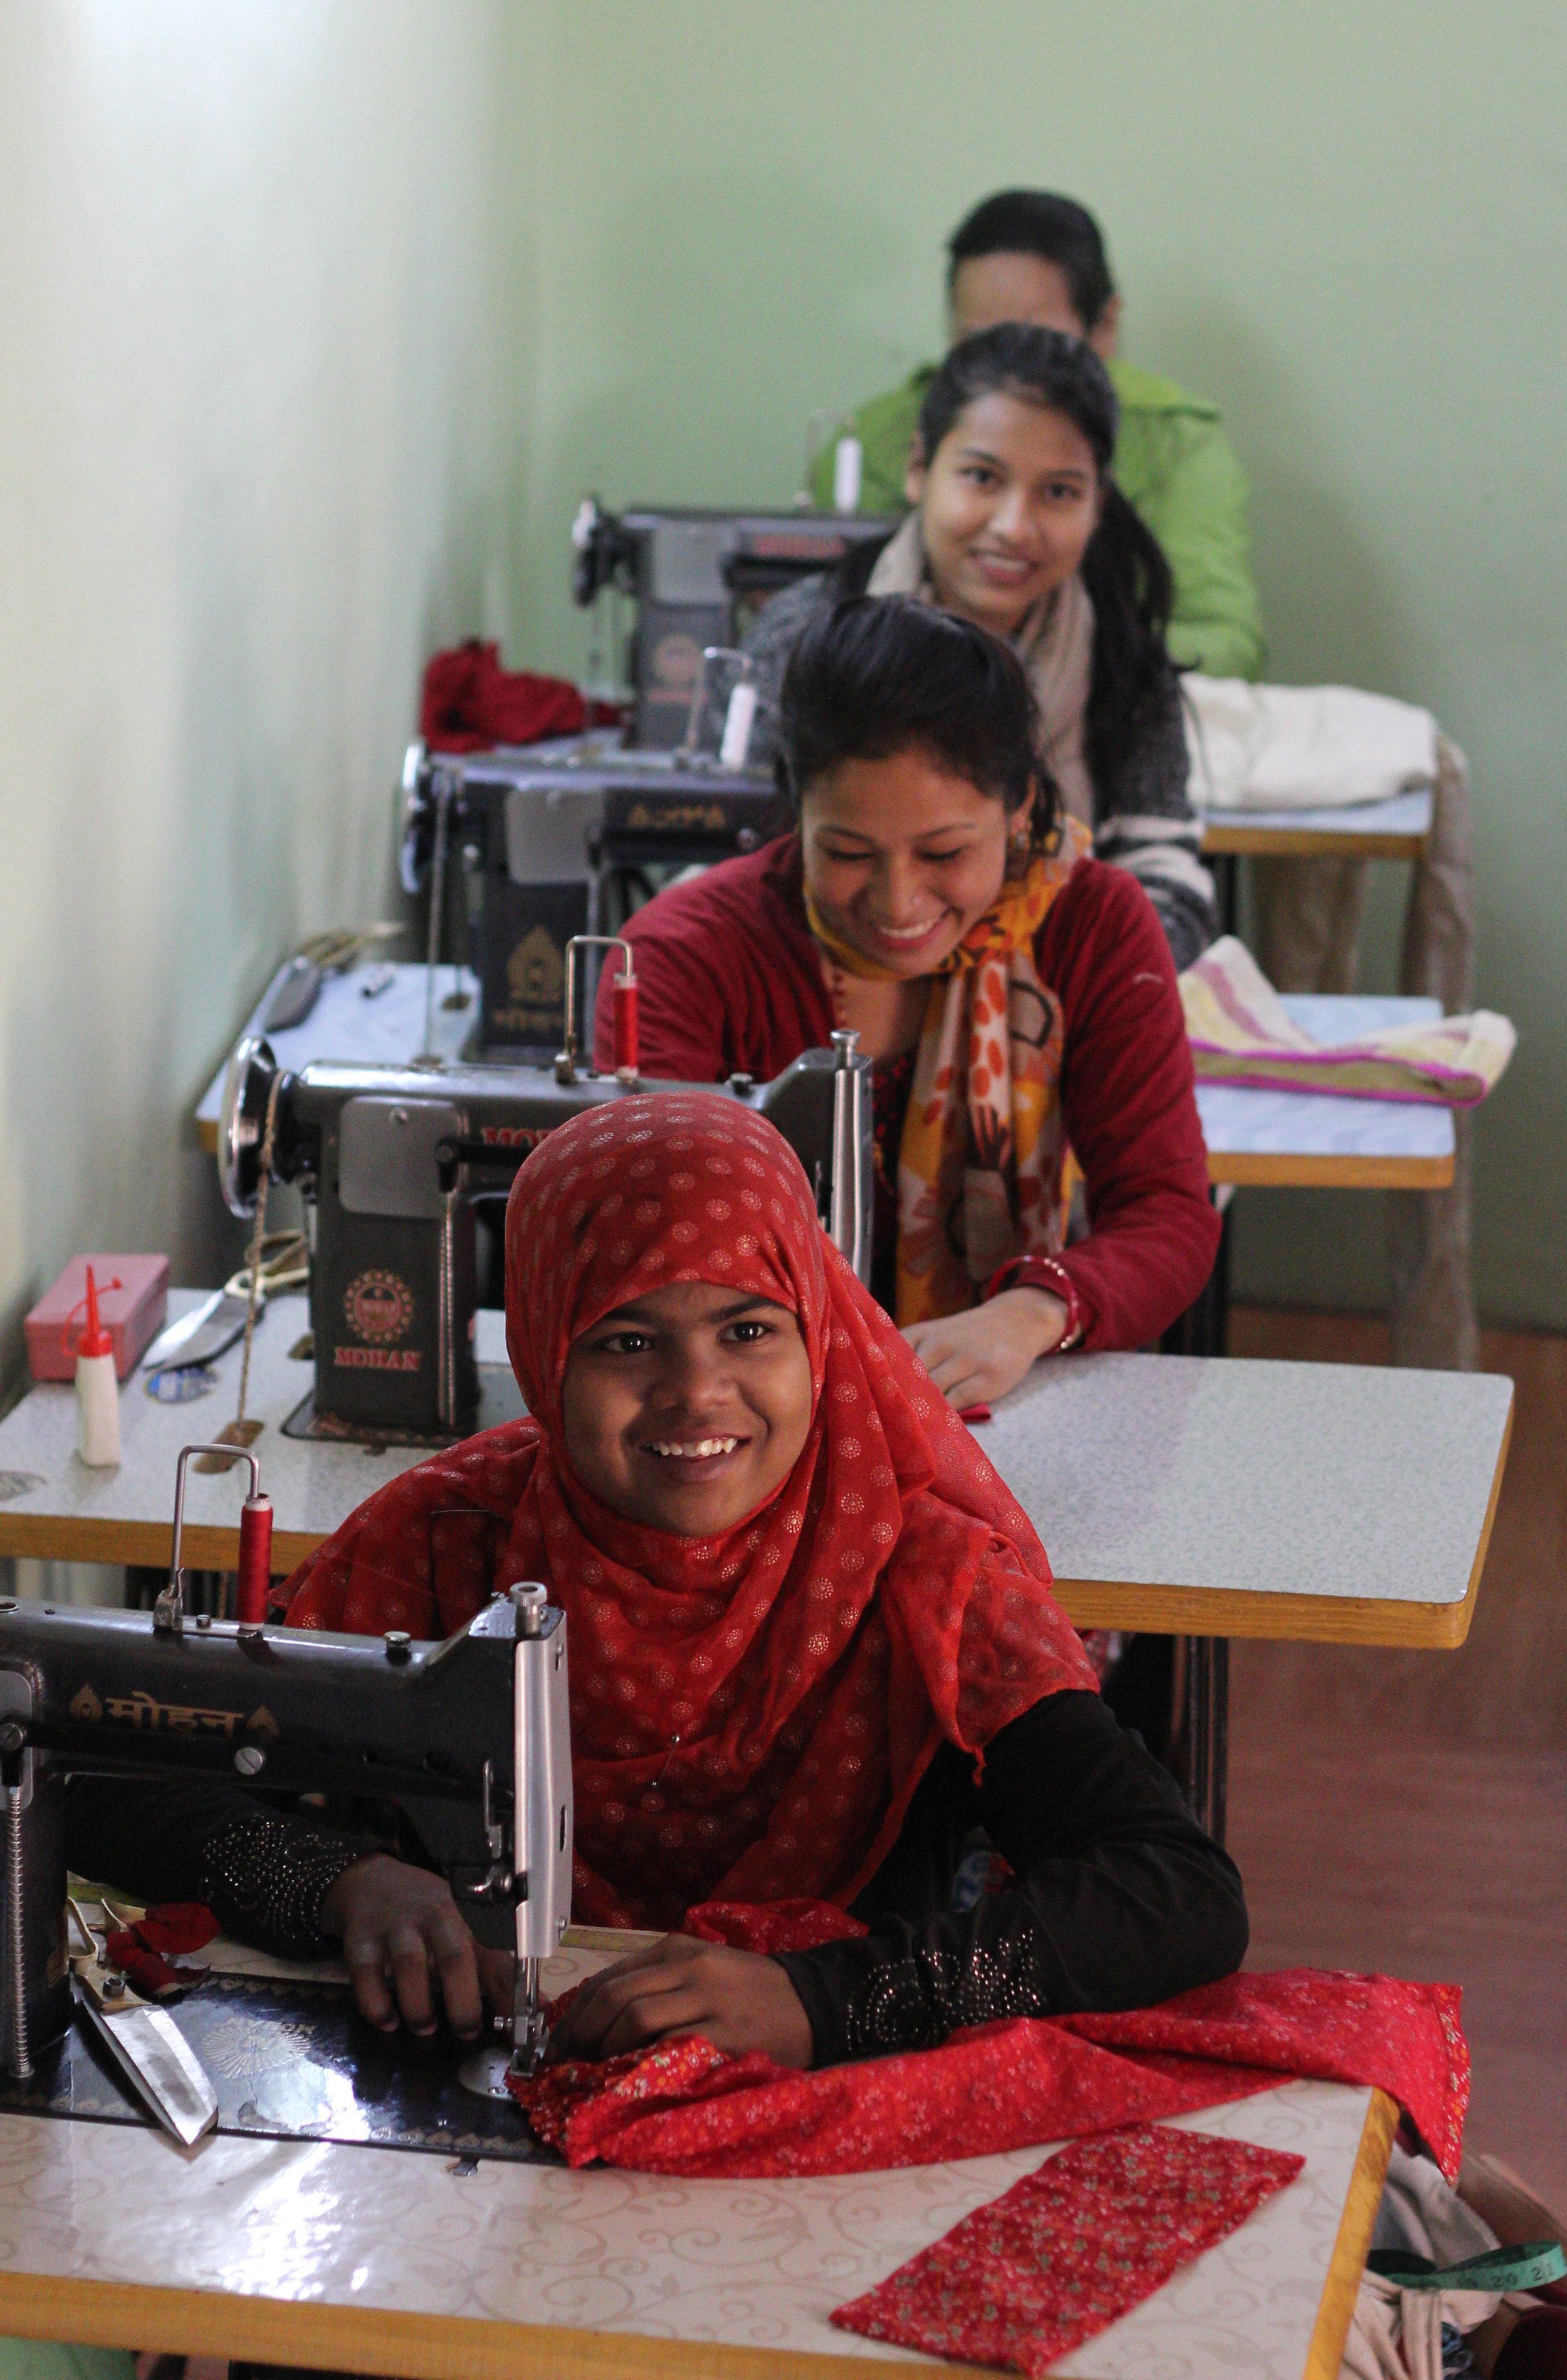 Girls sewing.jpg